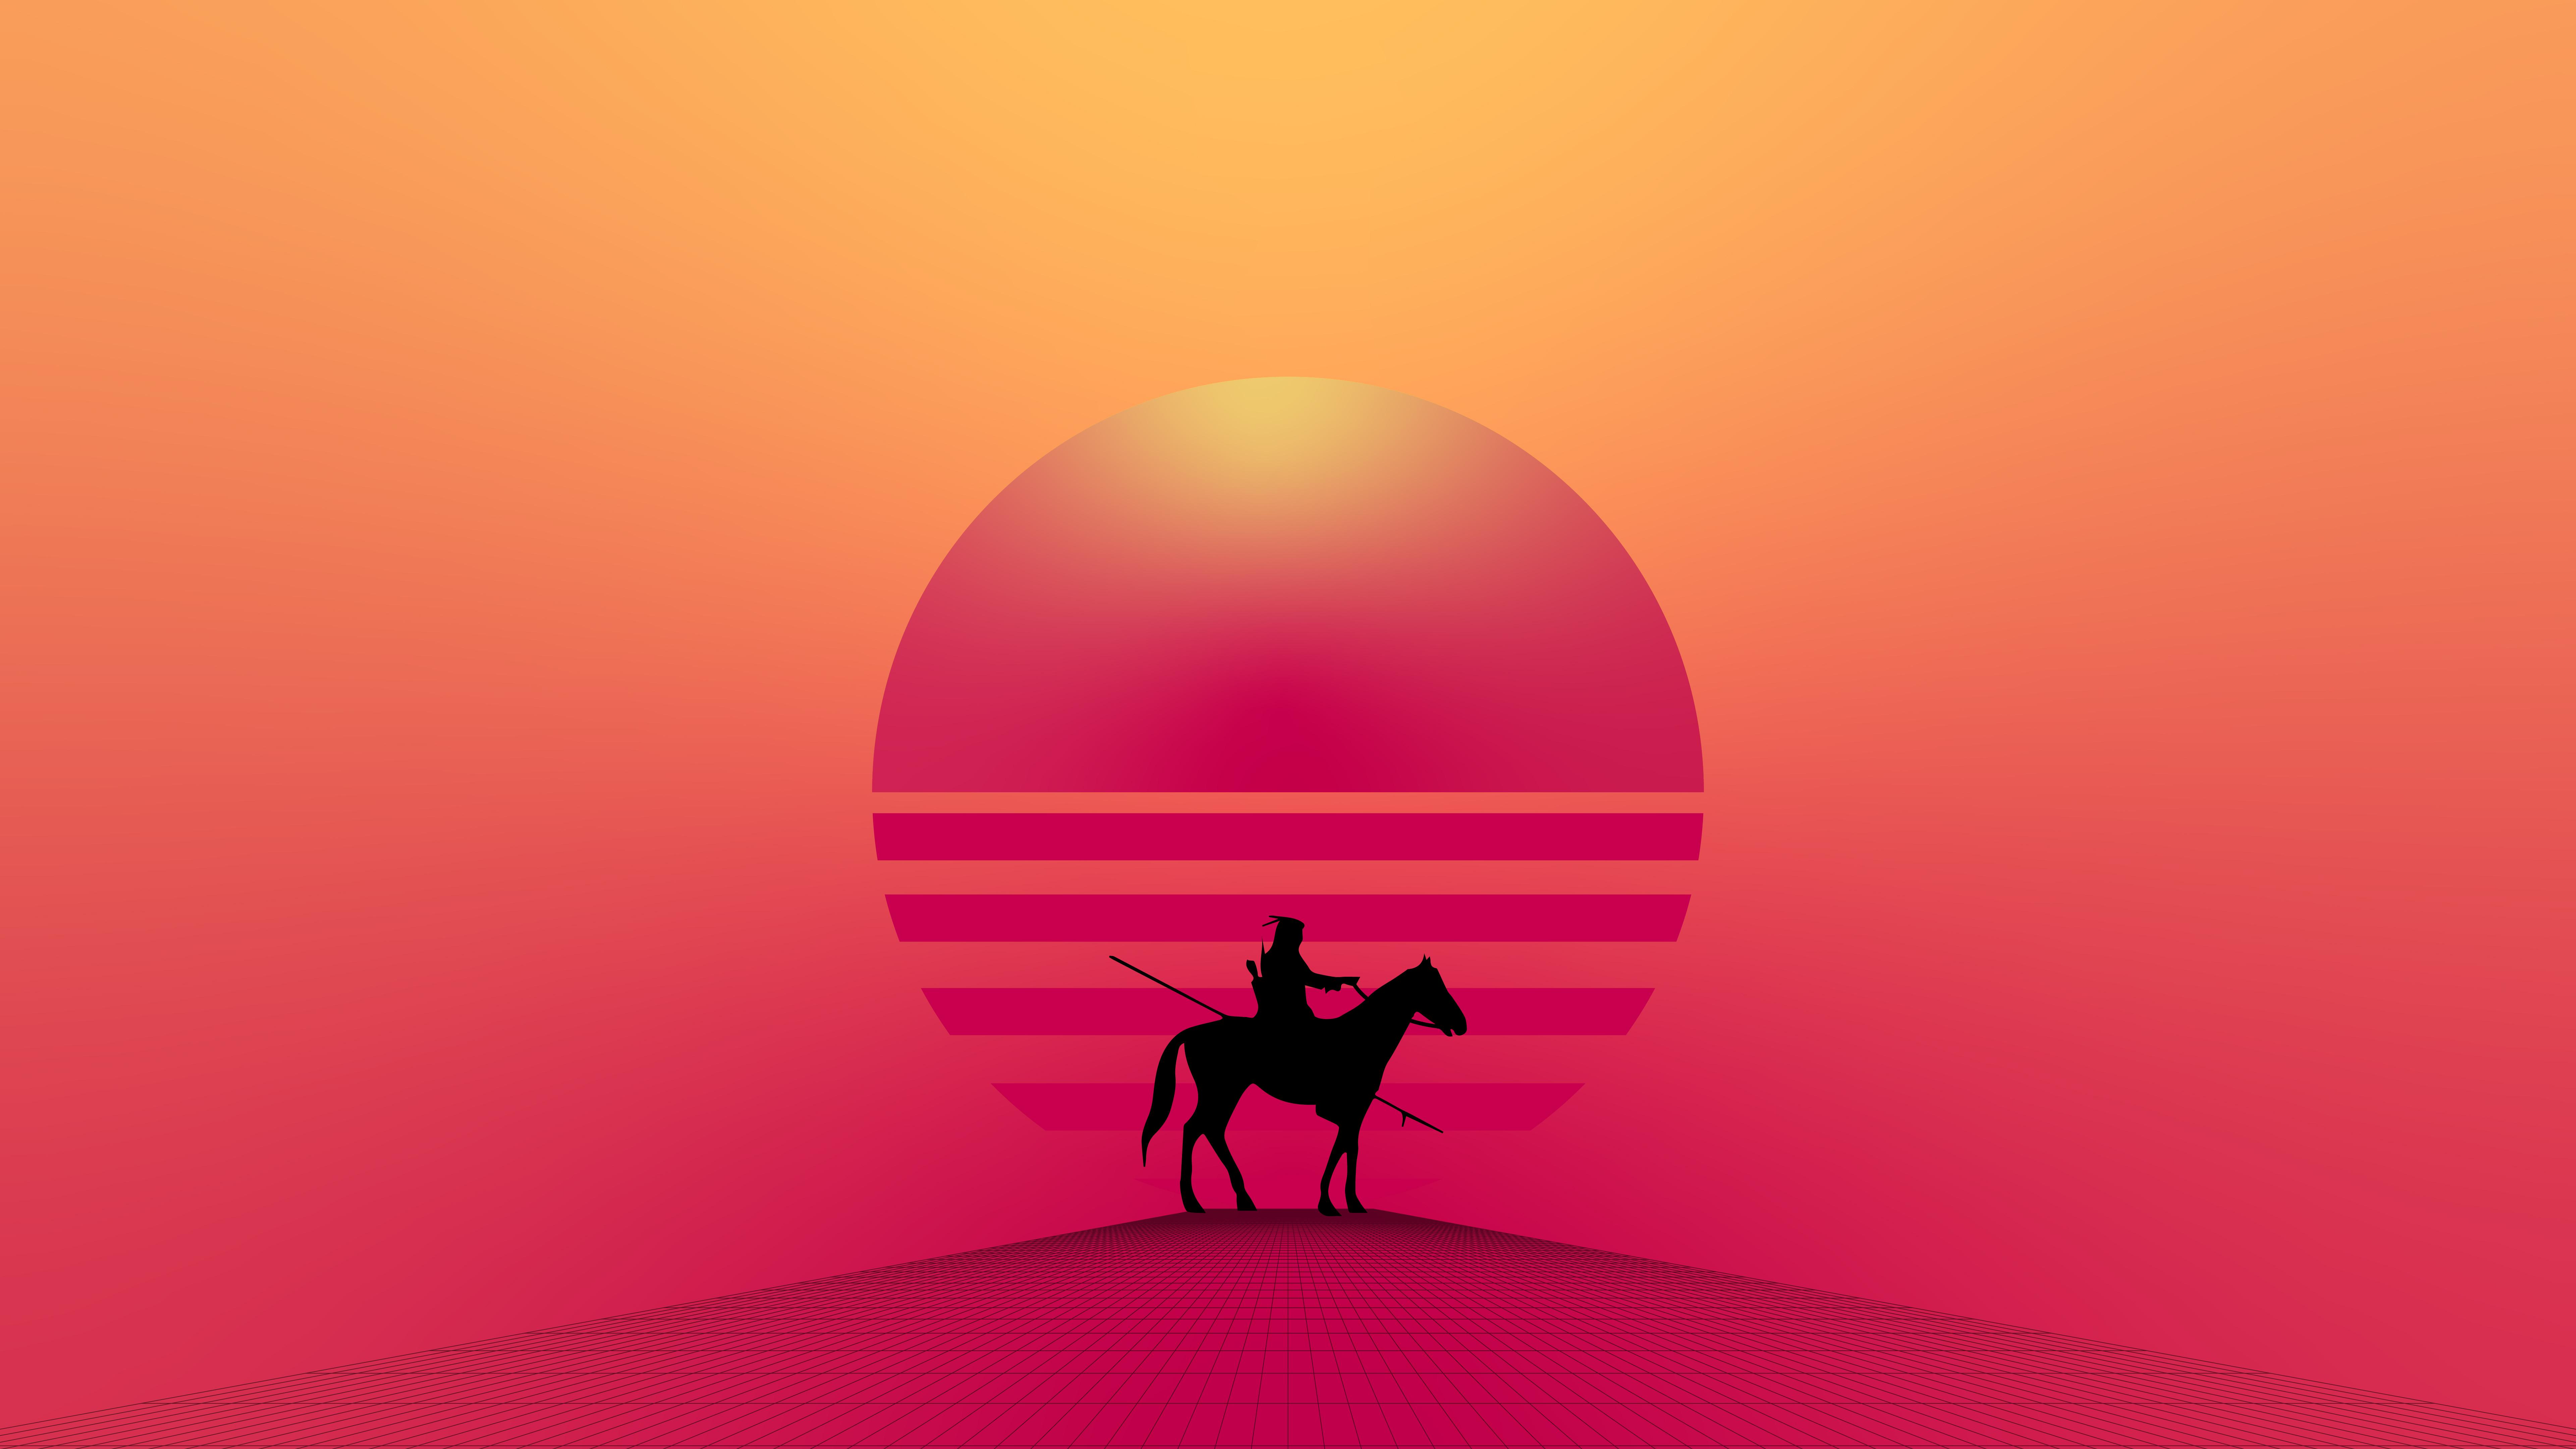 horse warrior minimal 4k 1603398265 - Horse Warrior Minimal 4k - Horse Warrior Minimal 4k wallpapers